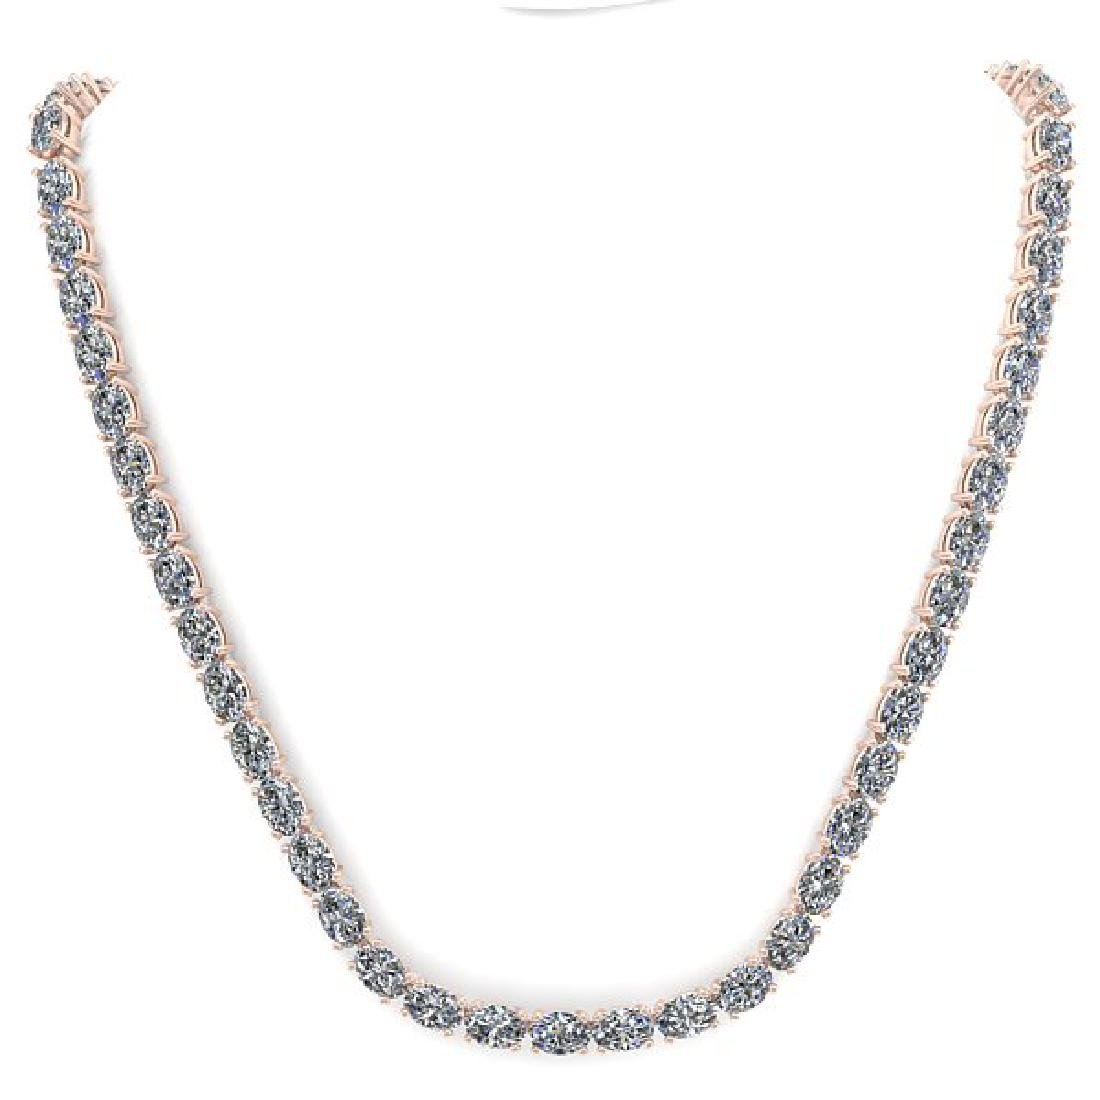 30 CTW Oval Cut Certified SI Diamond Necklace 18K Rose - 3